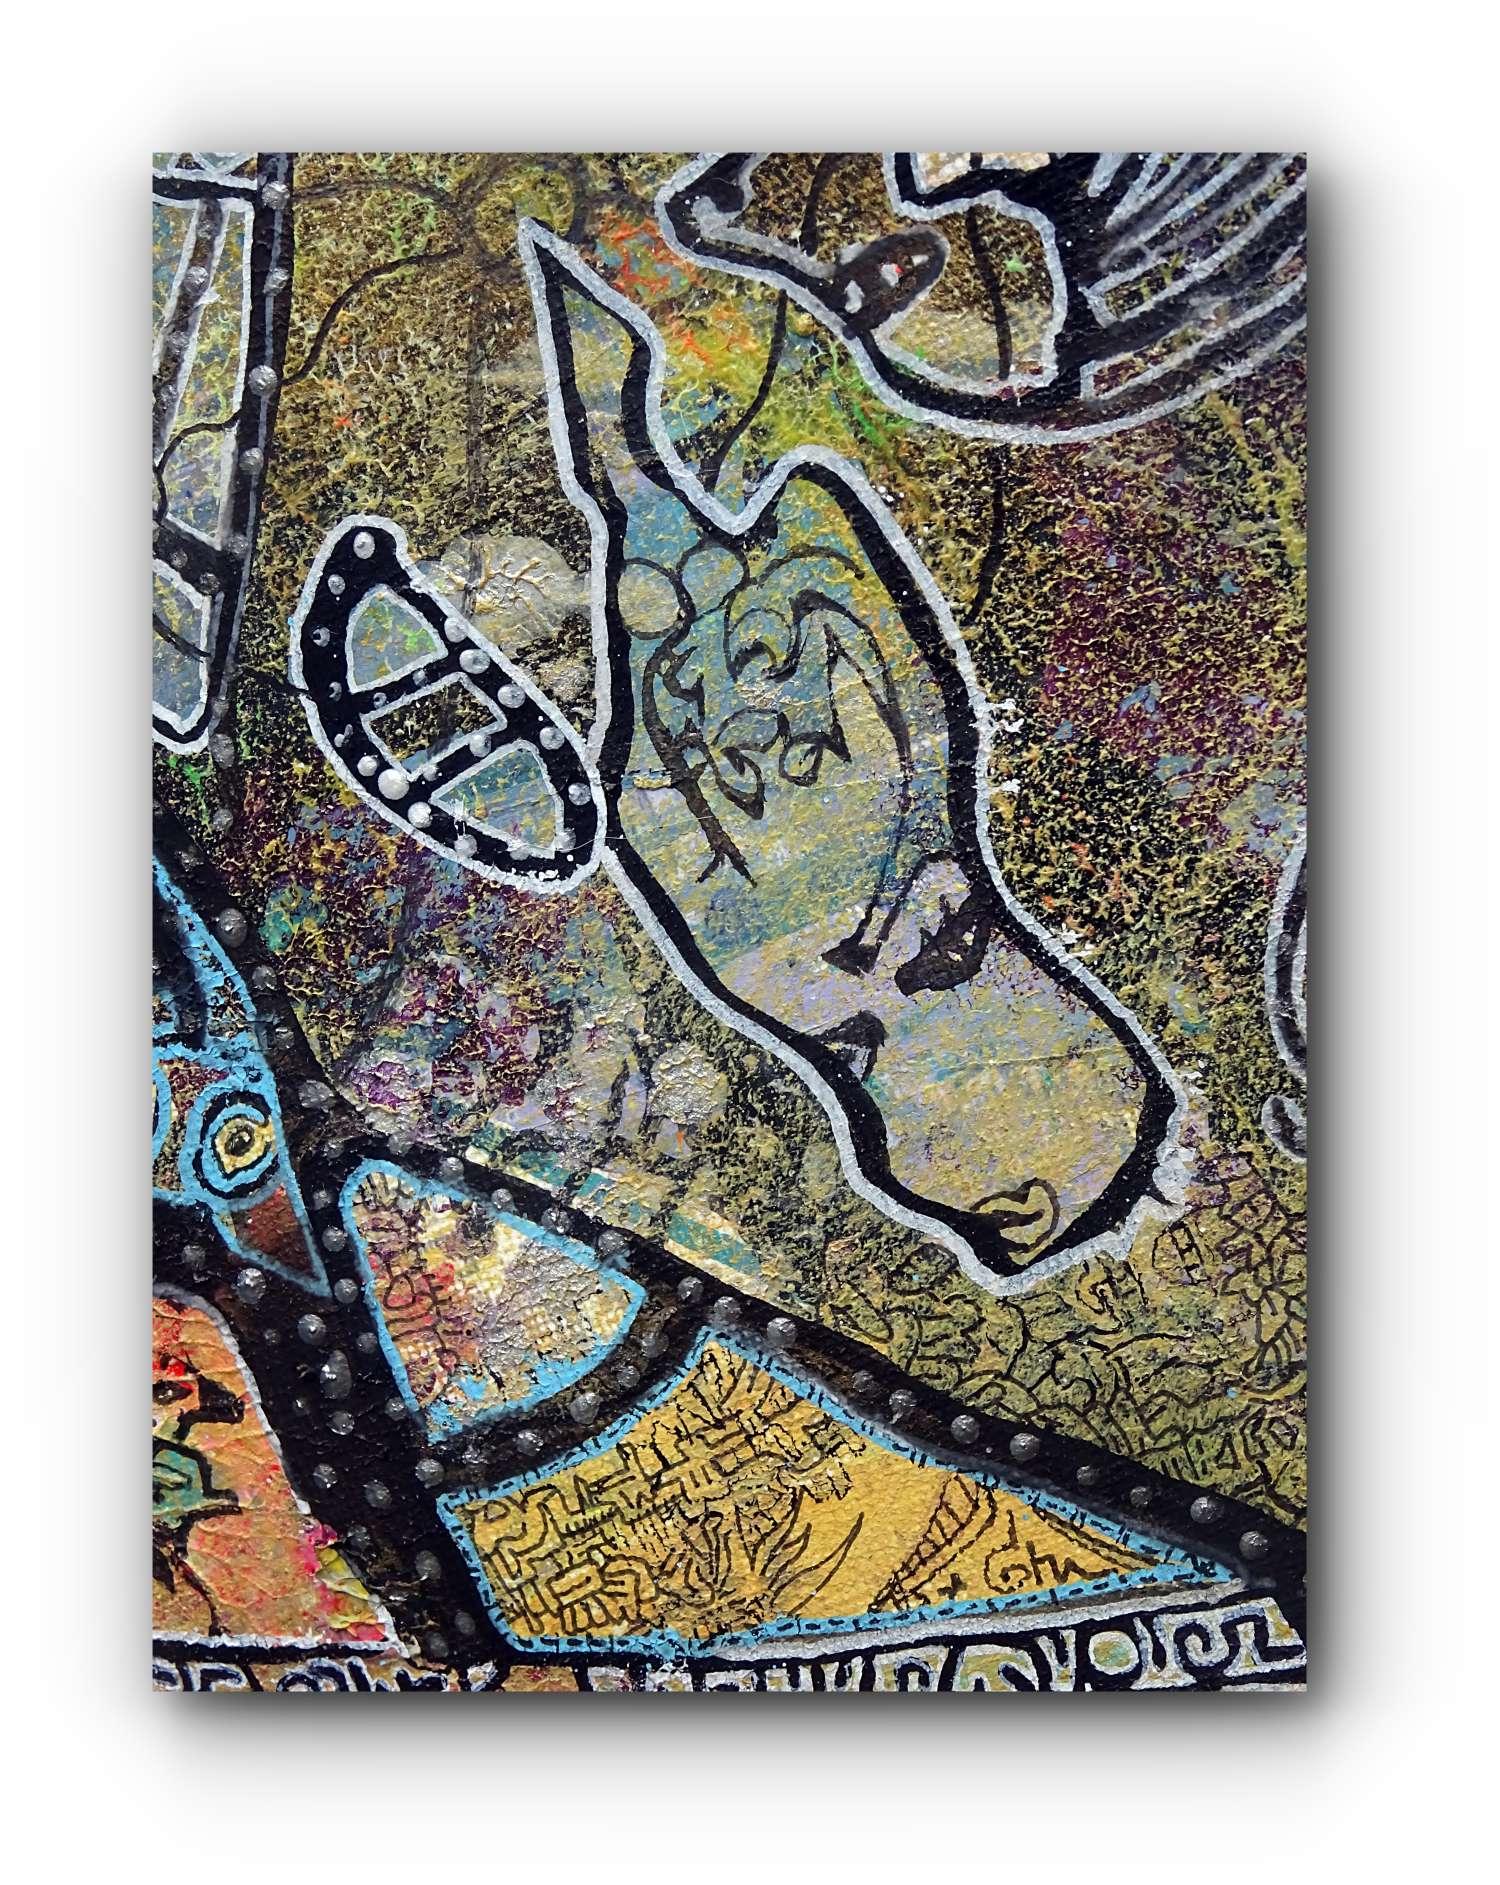 painting-detail-14-desert-dwellers-artists-ingress-vortices.jpg